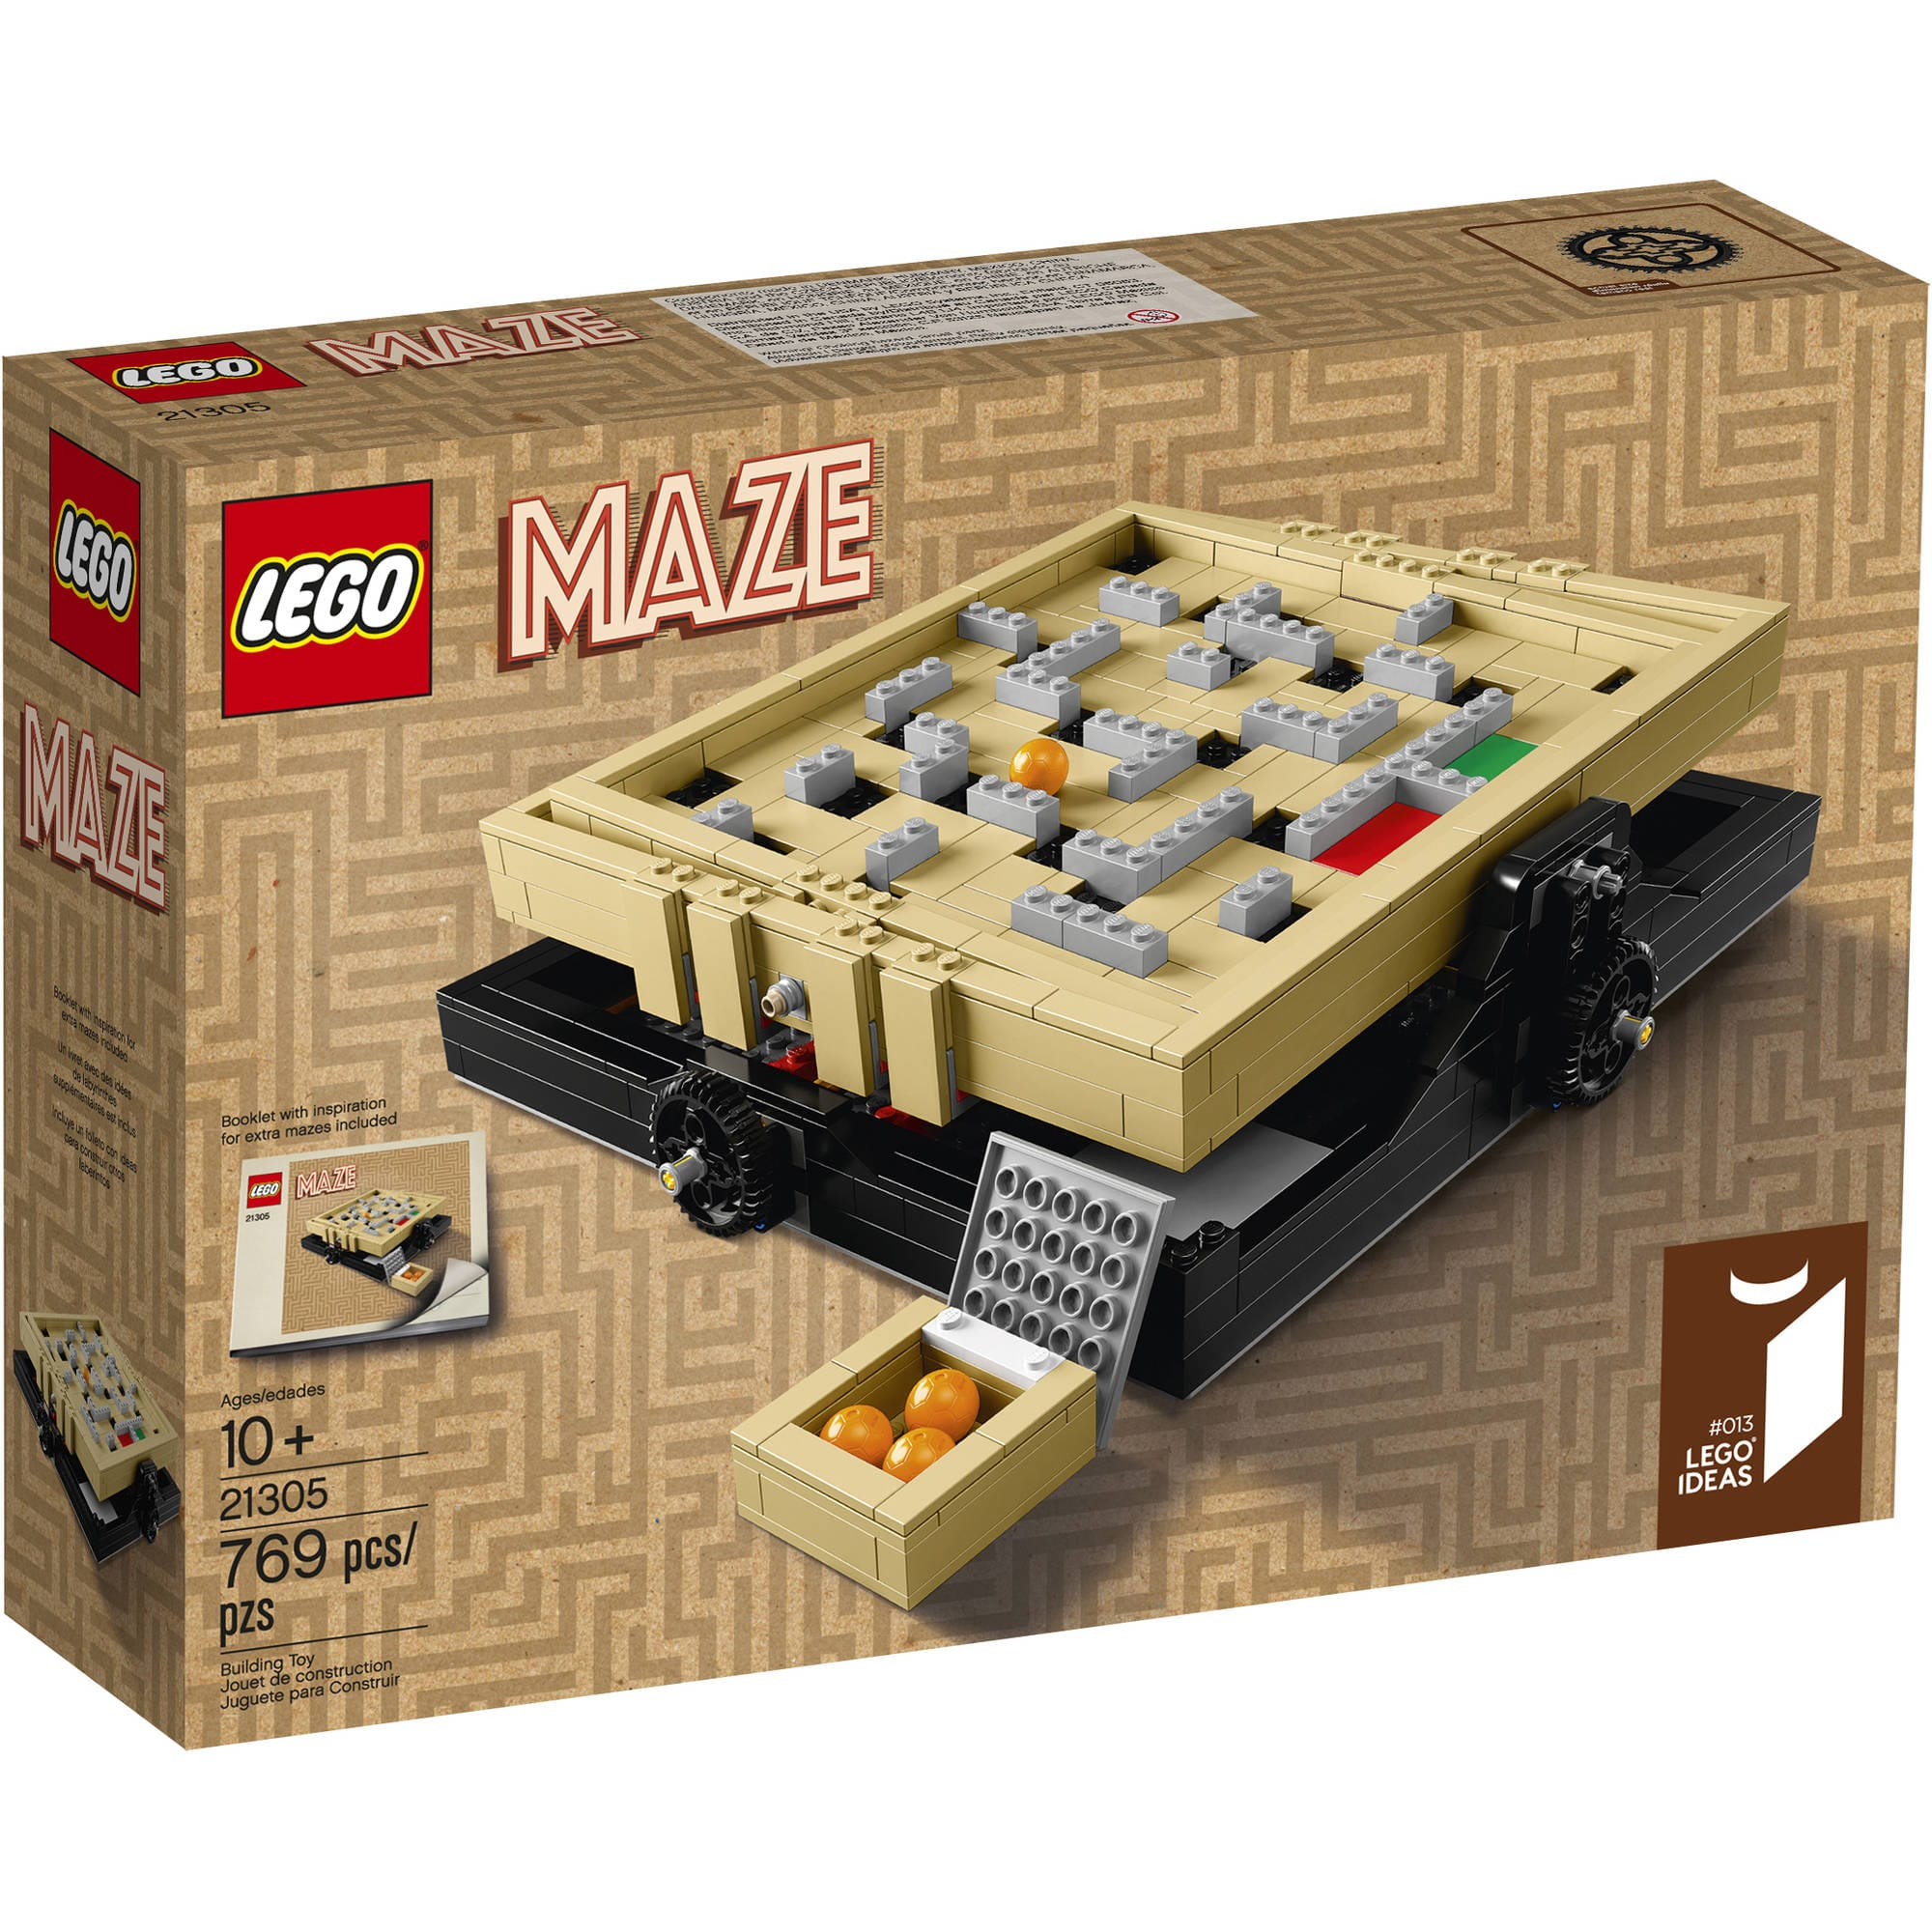 LEGO Ideas Maze Set  $49 + Free Store Pickup